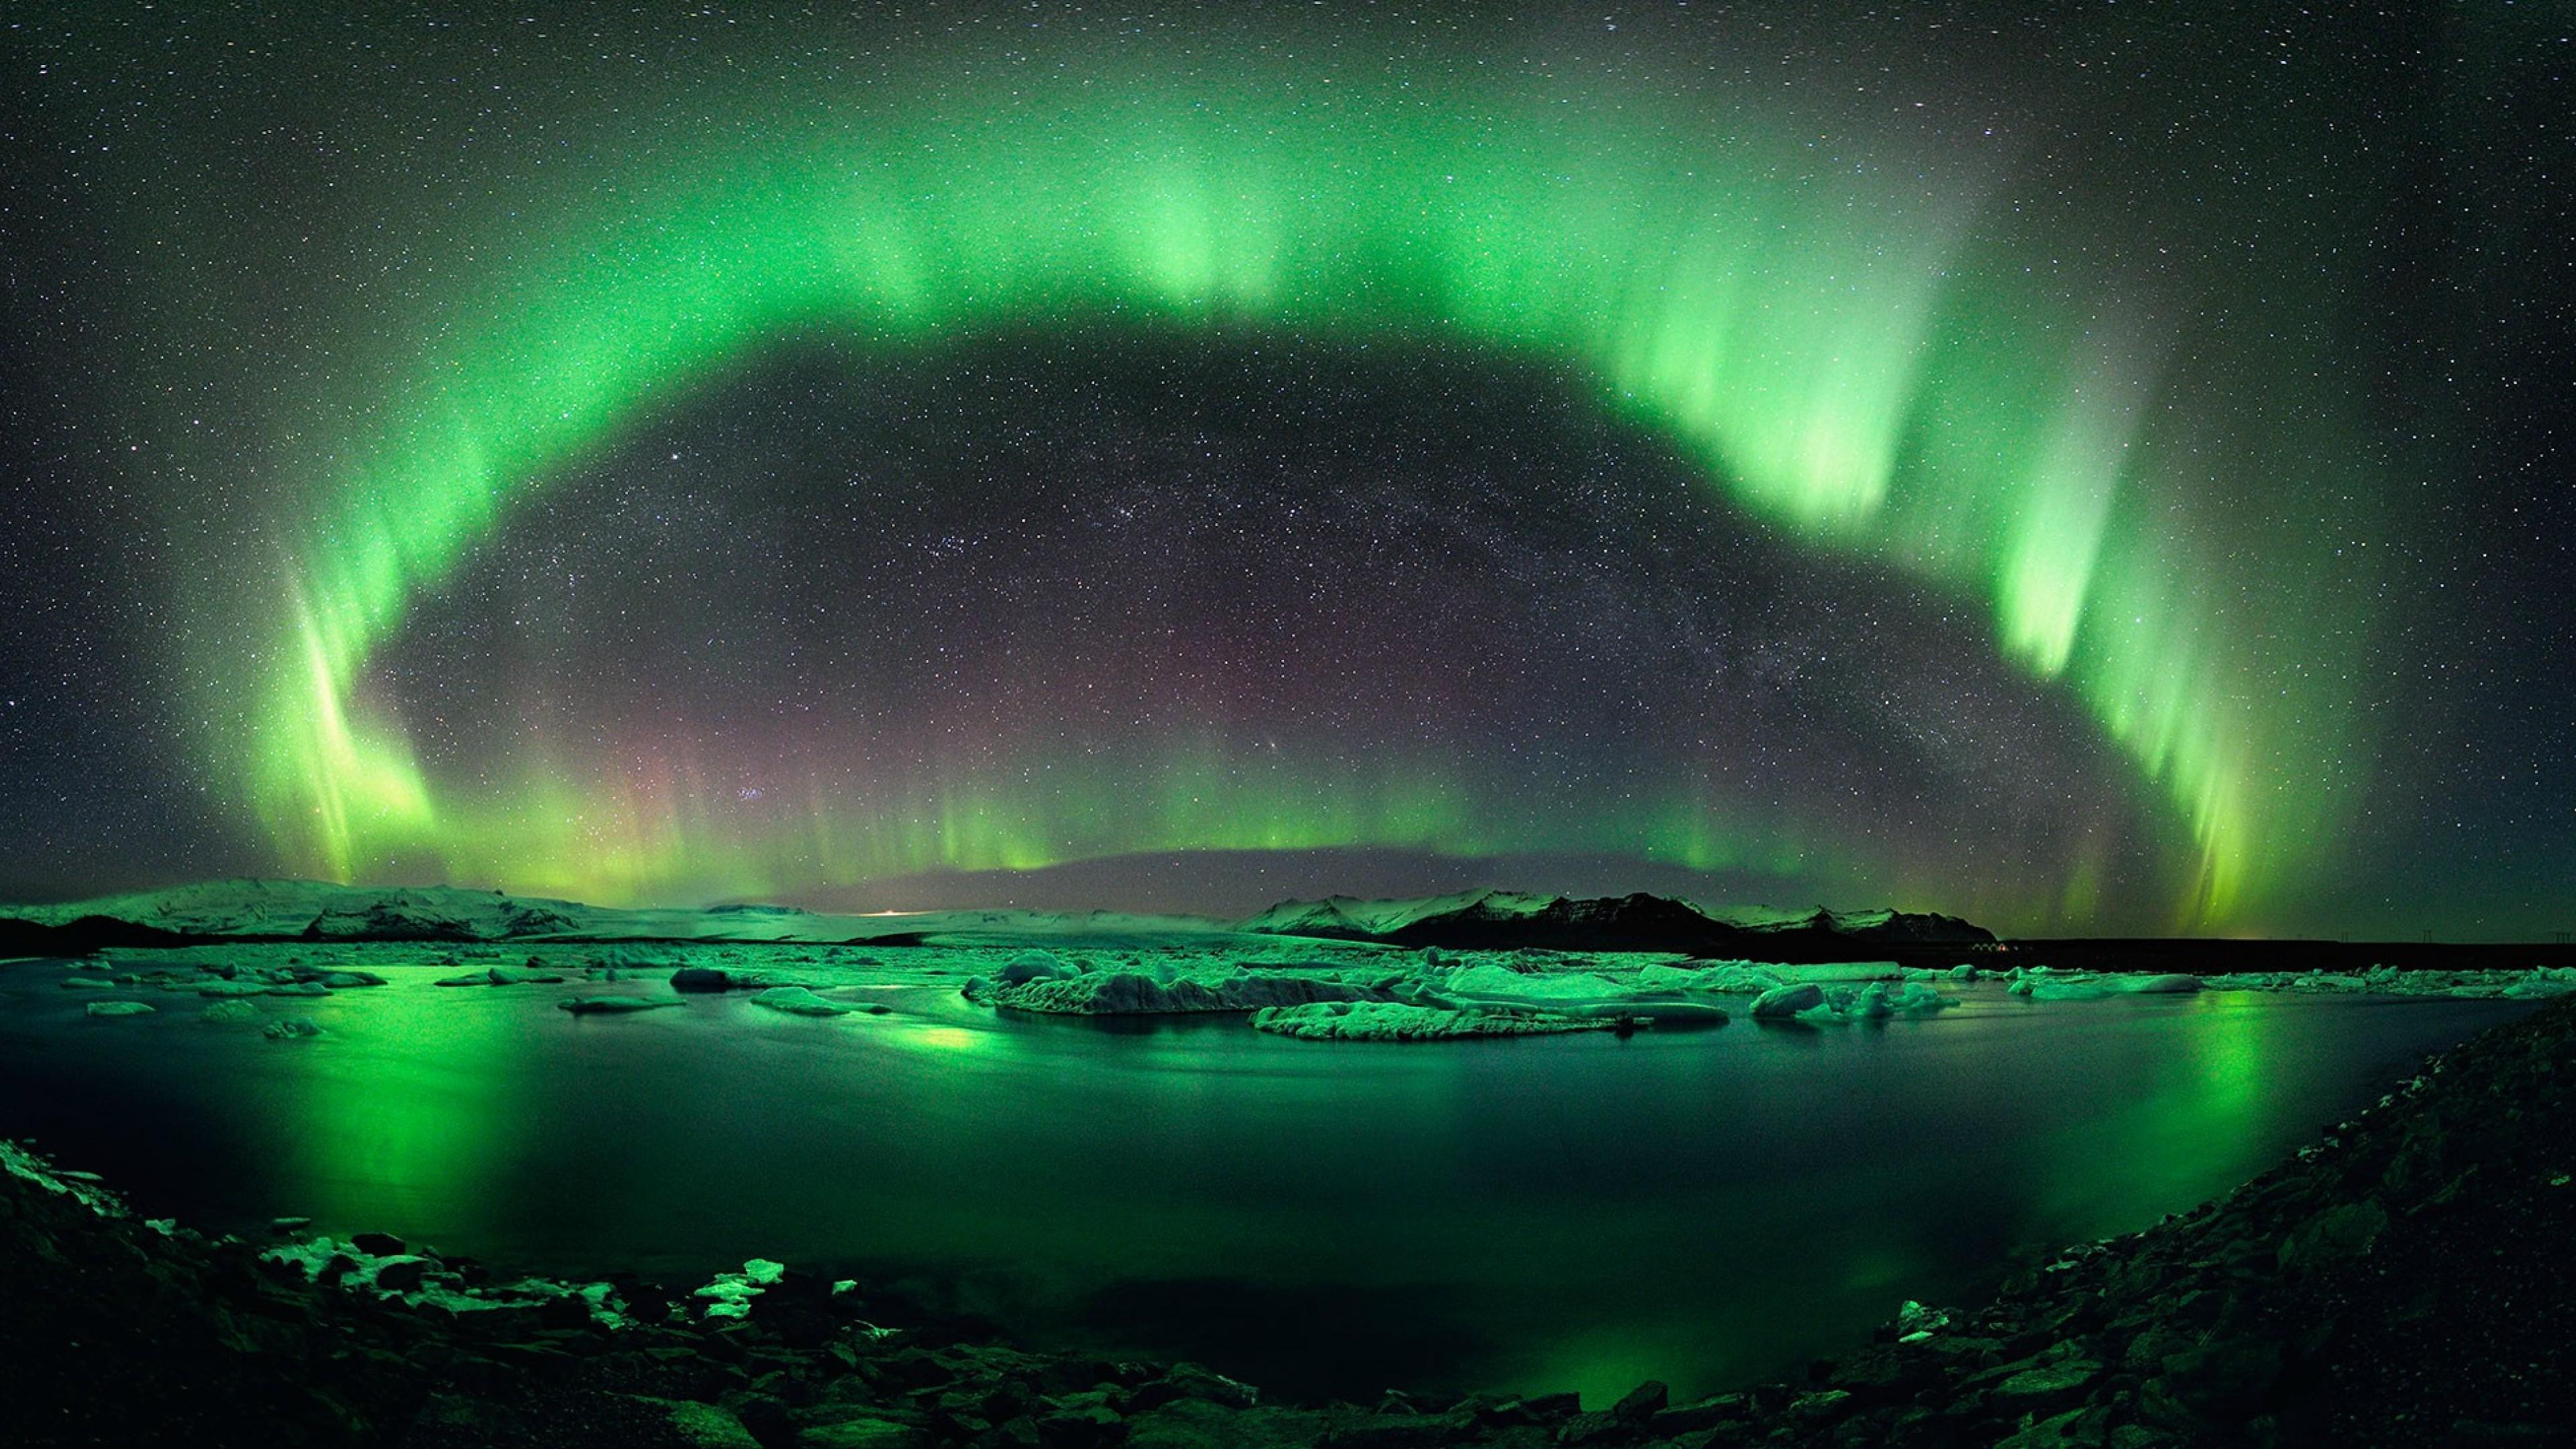 Free Download Green Aurora Borealis Wallpaper For Desktop